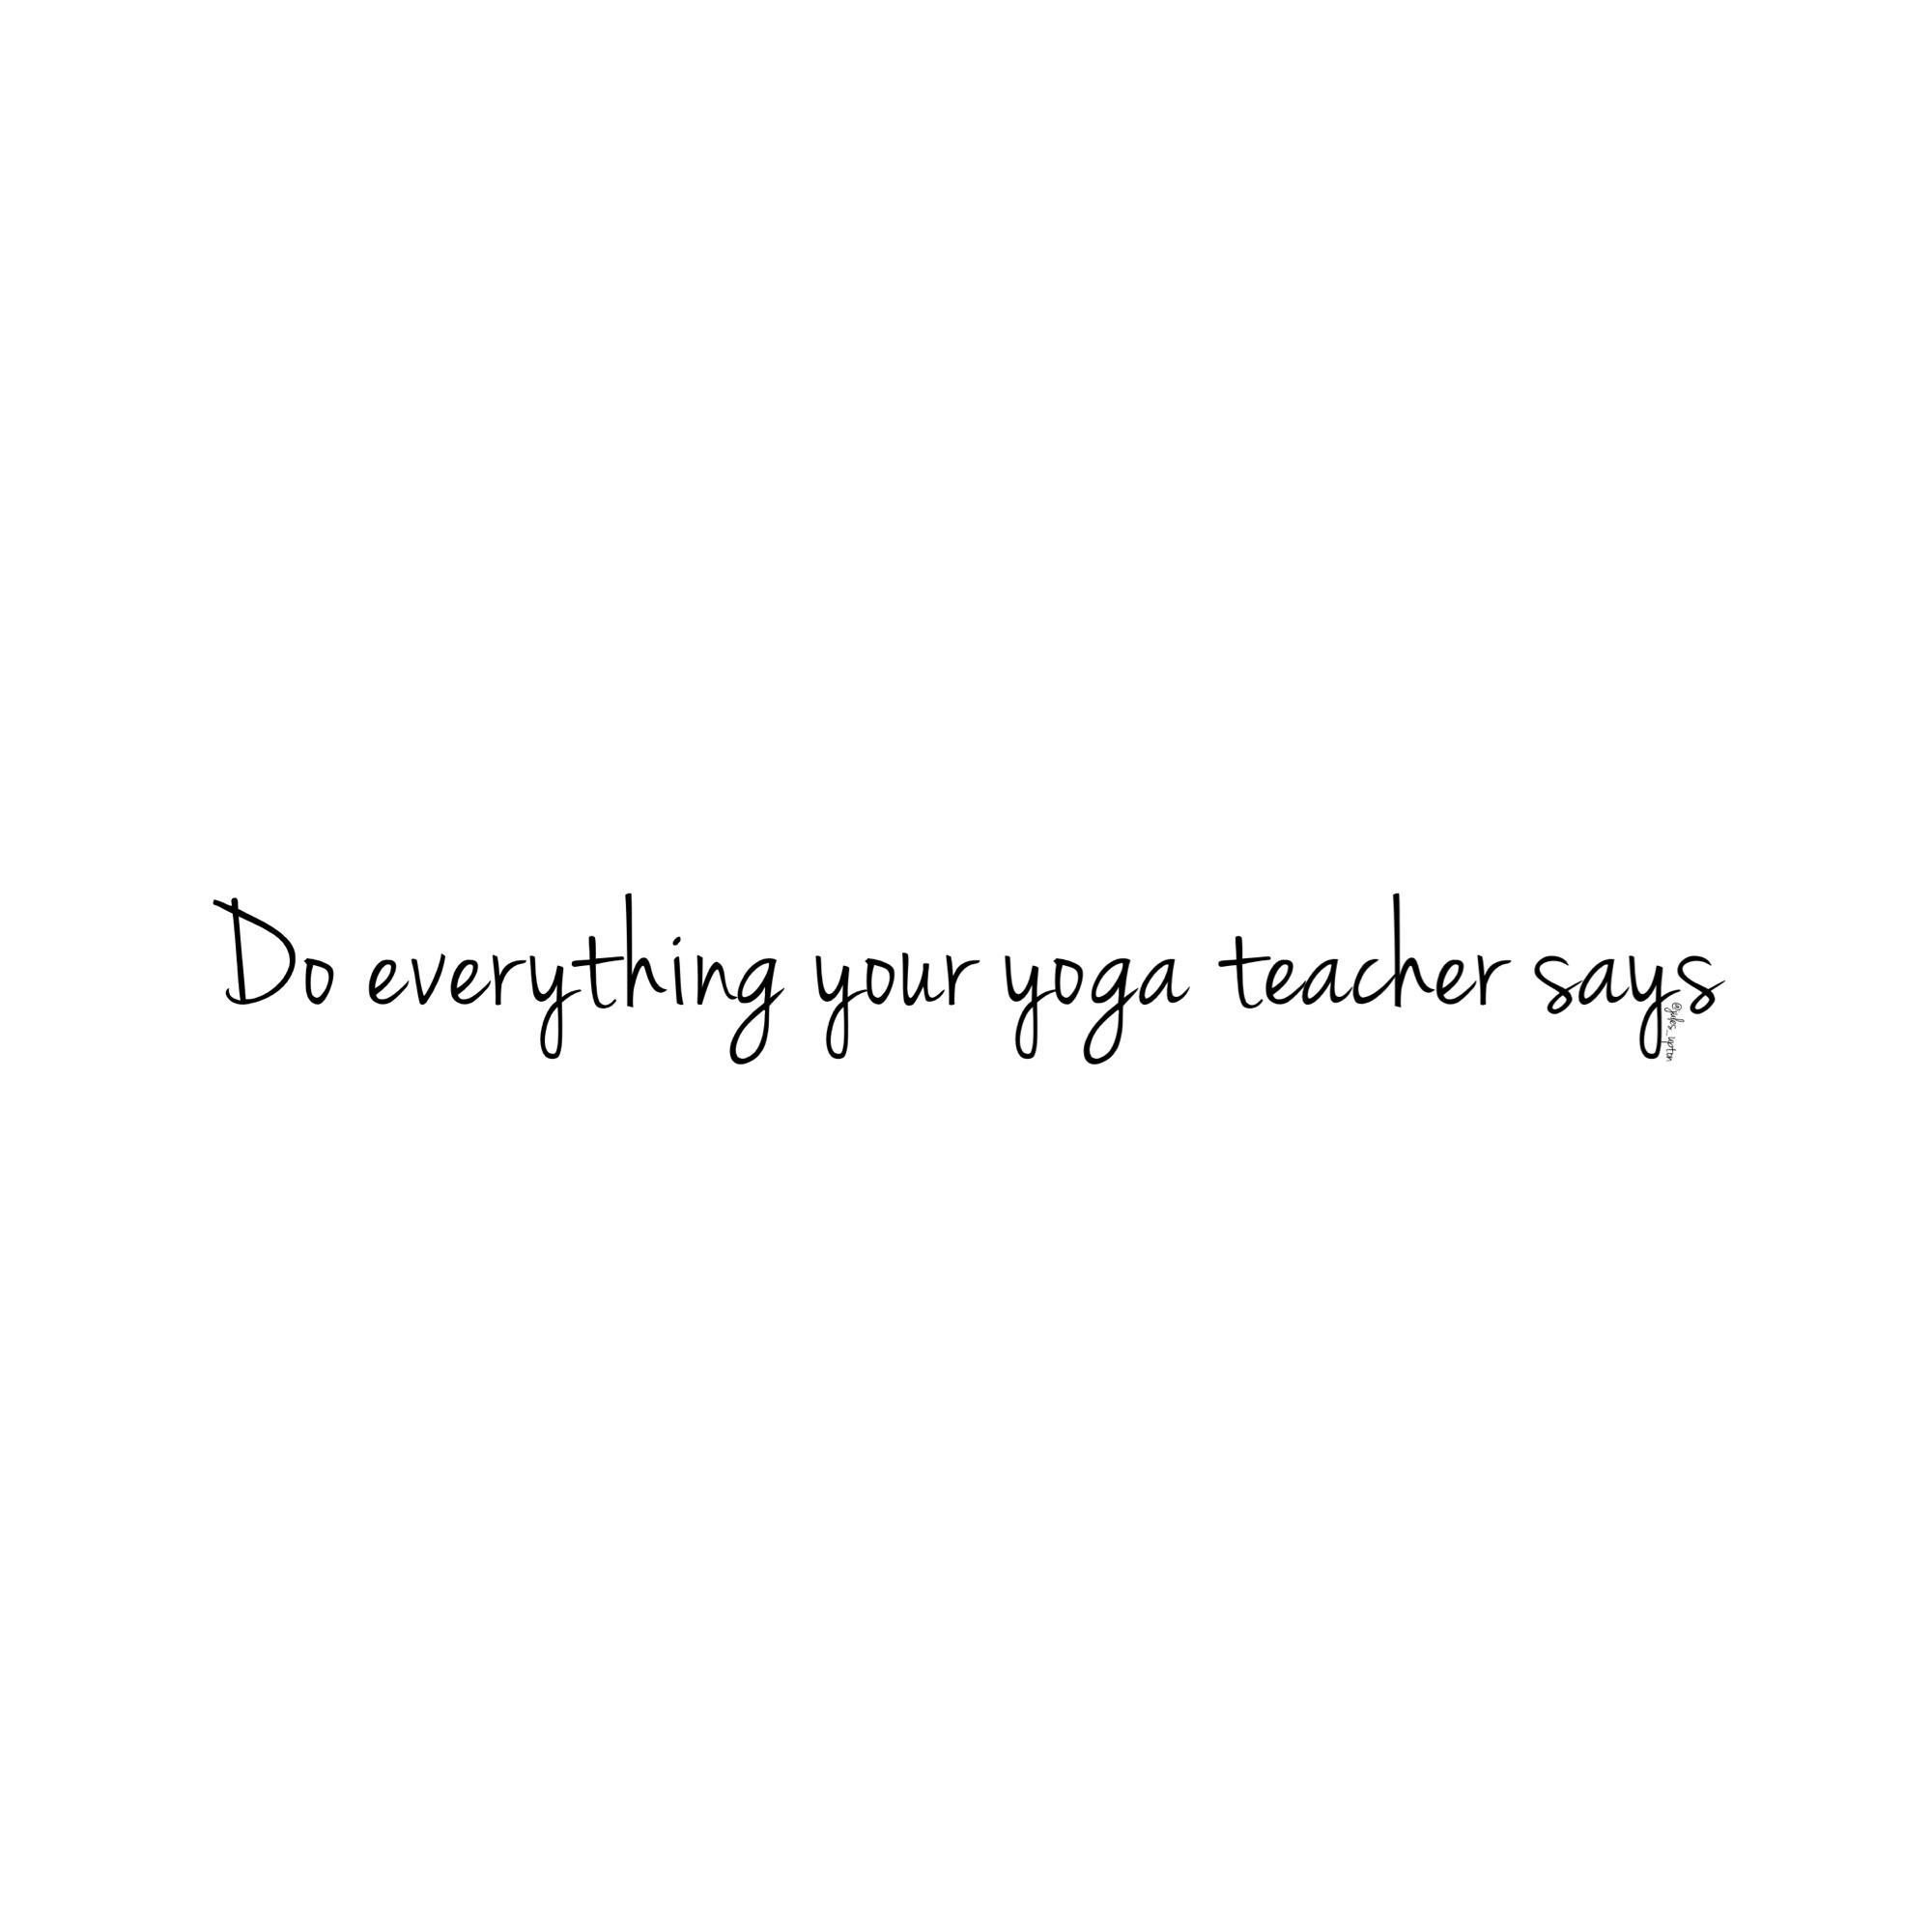 jules Upton Do everything your yoga teacher says.JPG